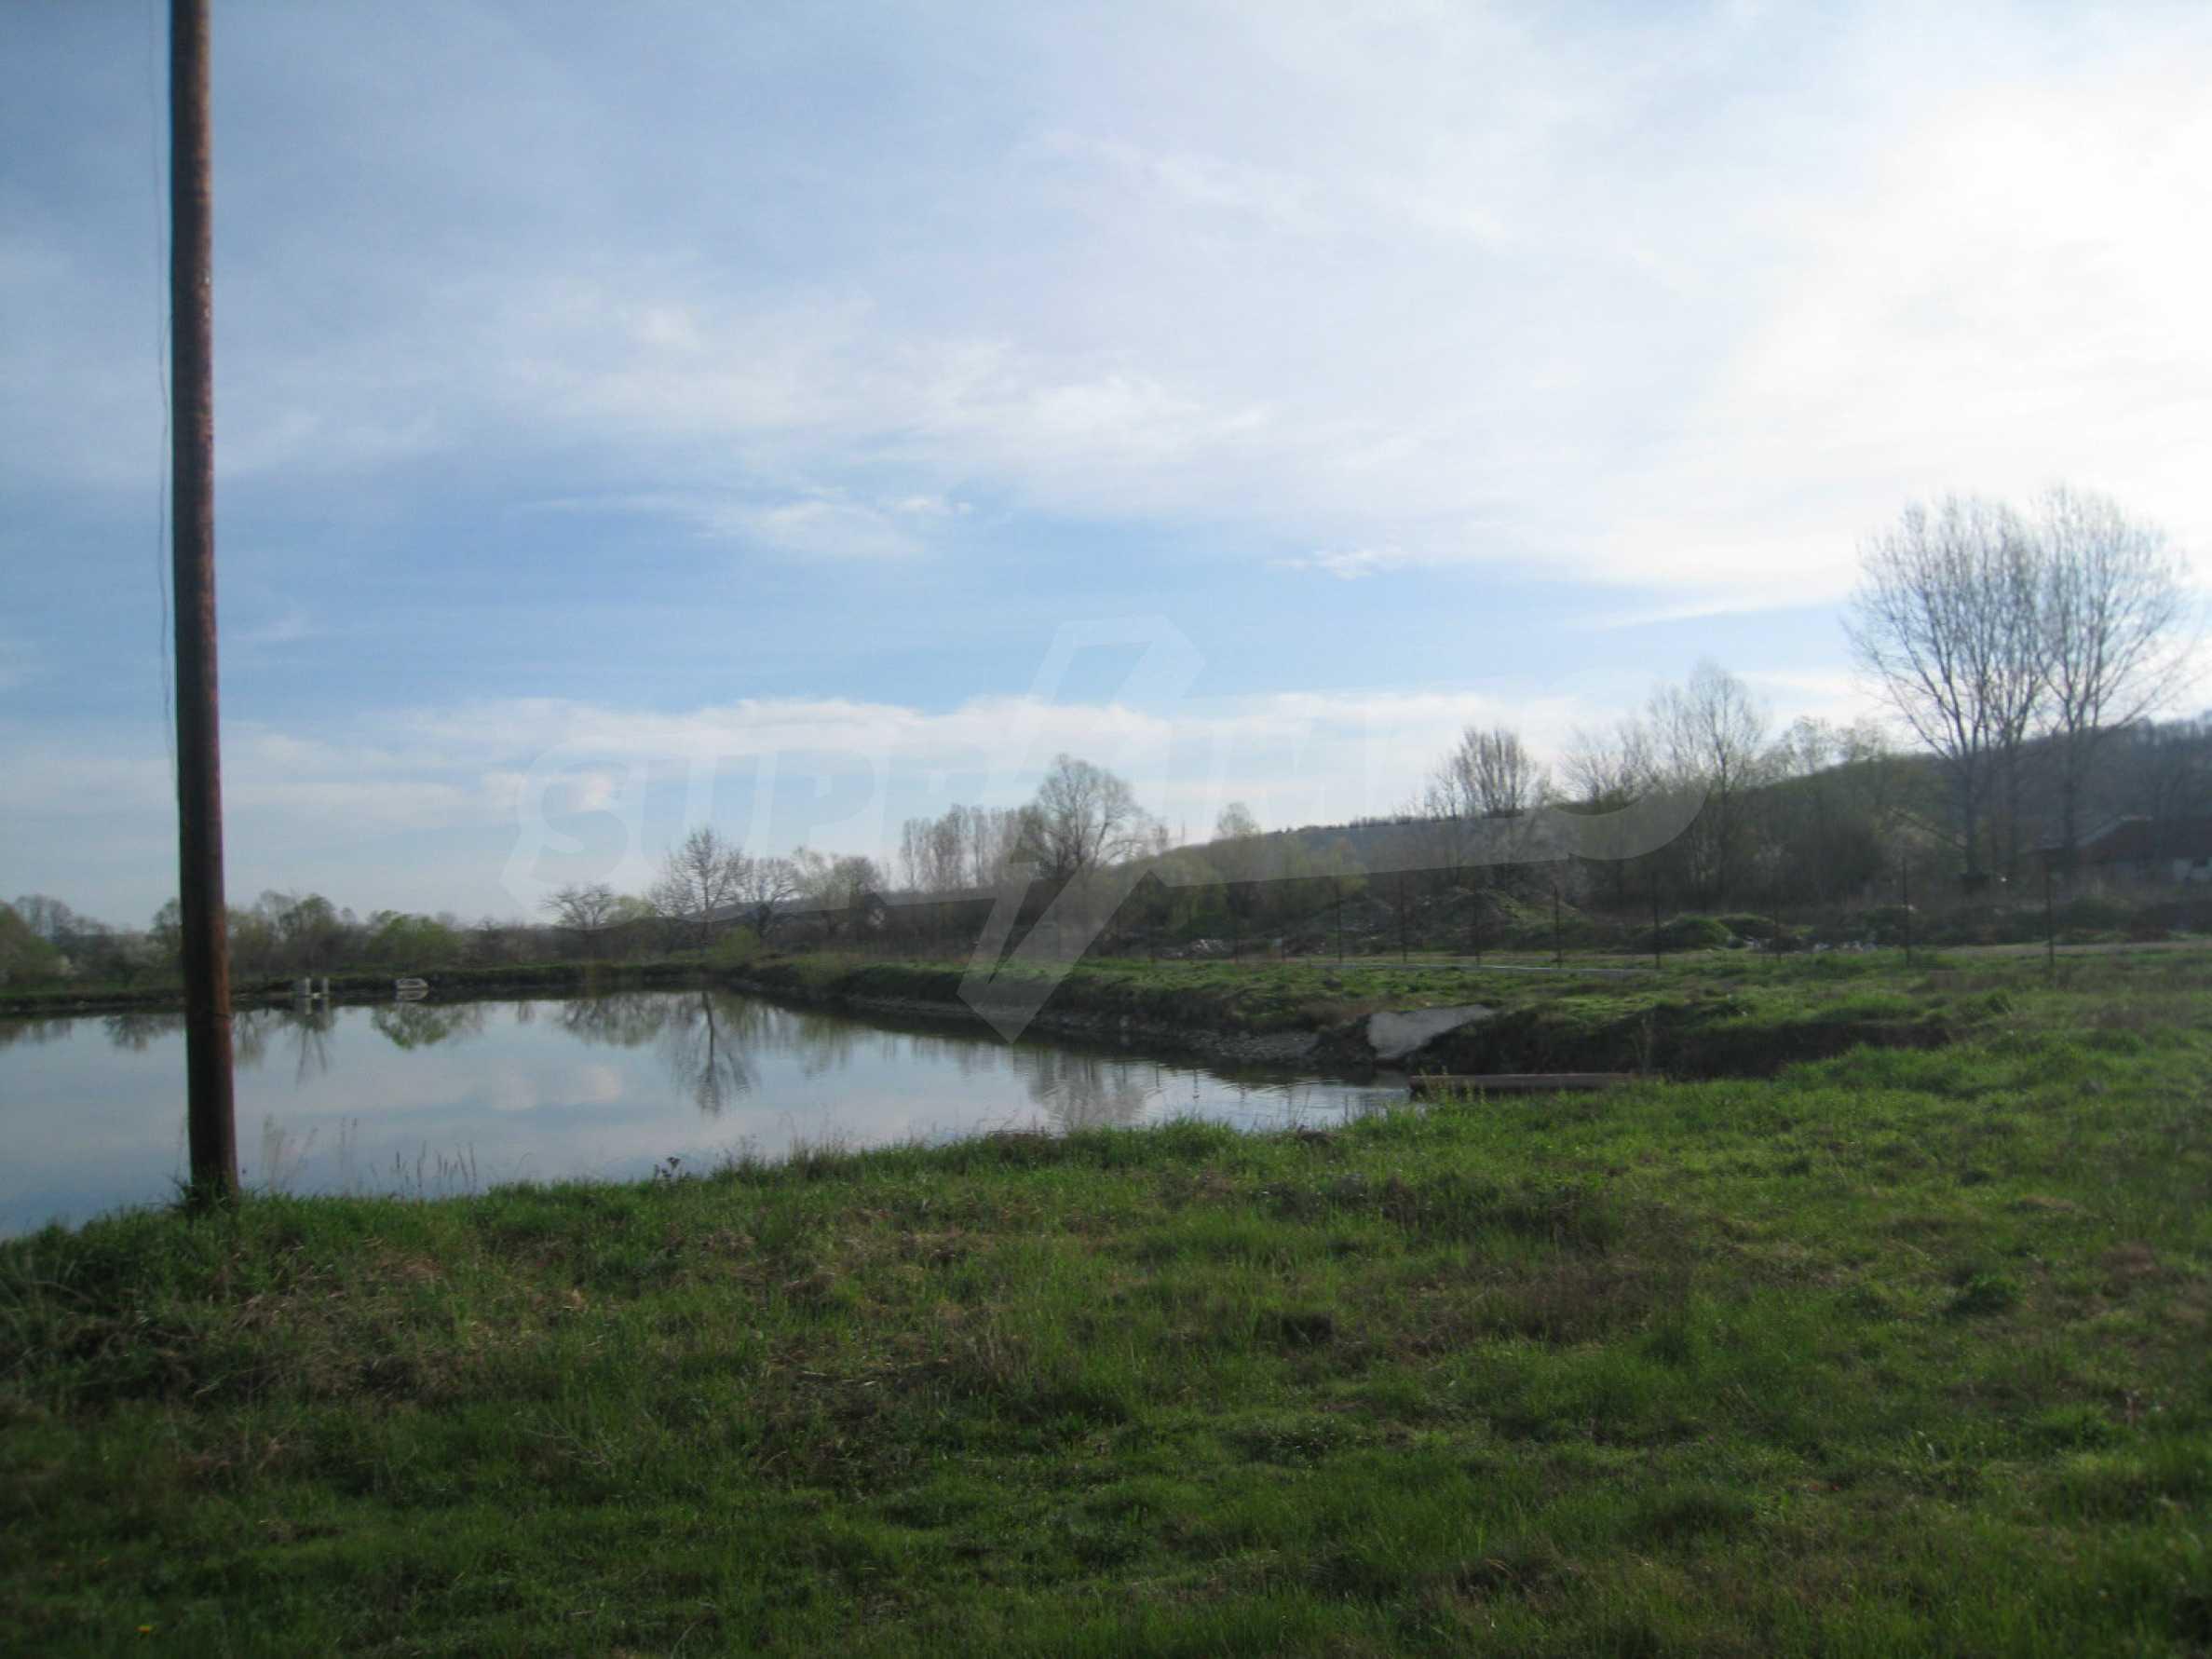 Fishpond, warehouses, residential areas and asphalt ground near Montana 21